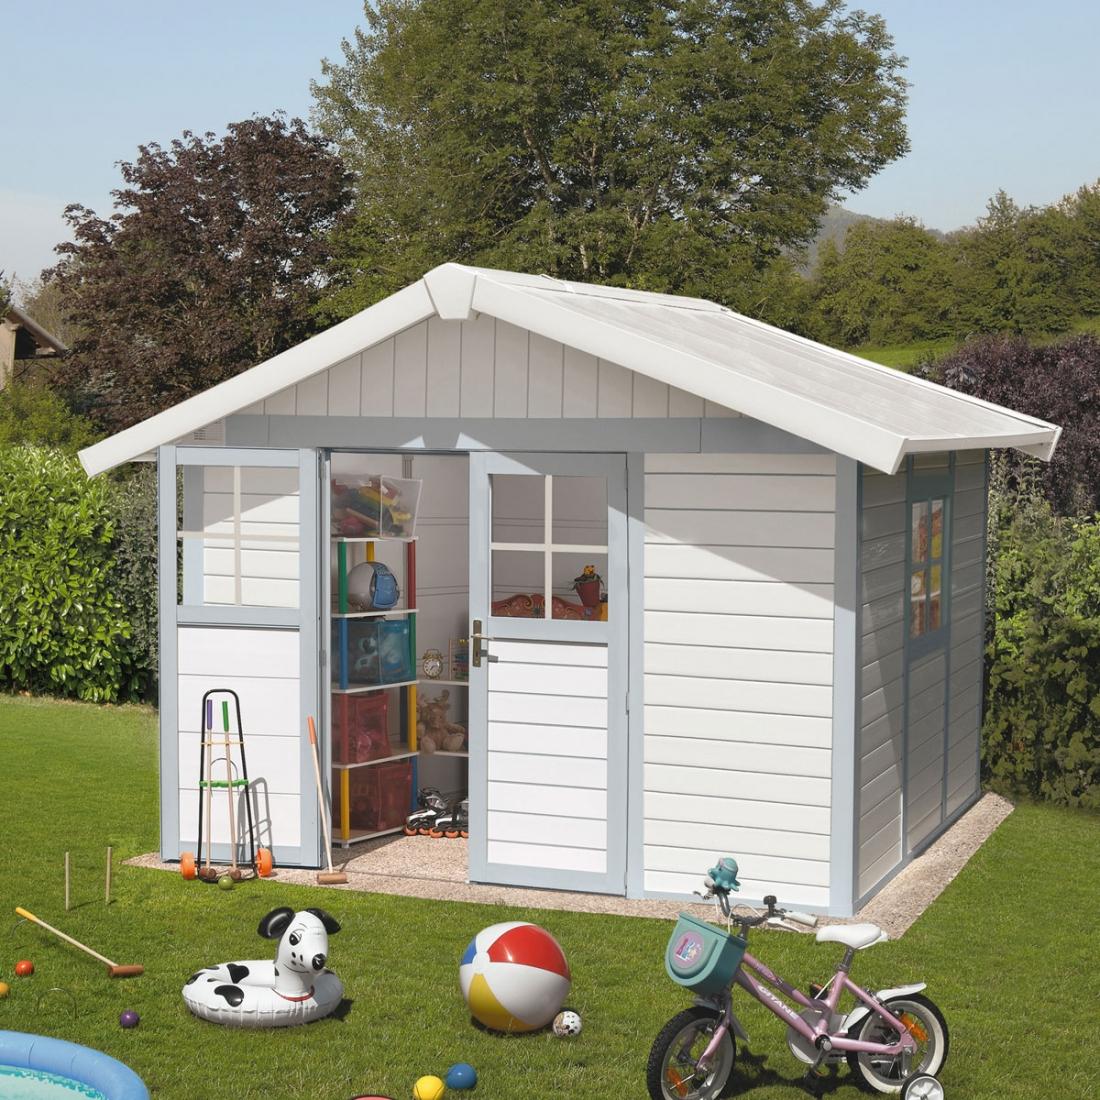 Abris Jardin Grosfillex Déco 7,5 - Zendart Design intérieur Abri De Jardin Grosfillex